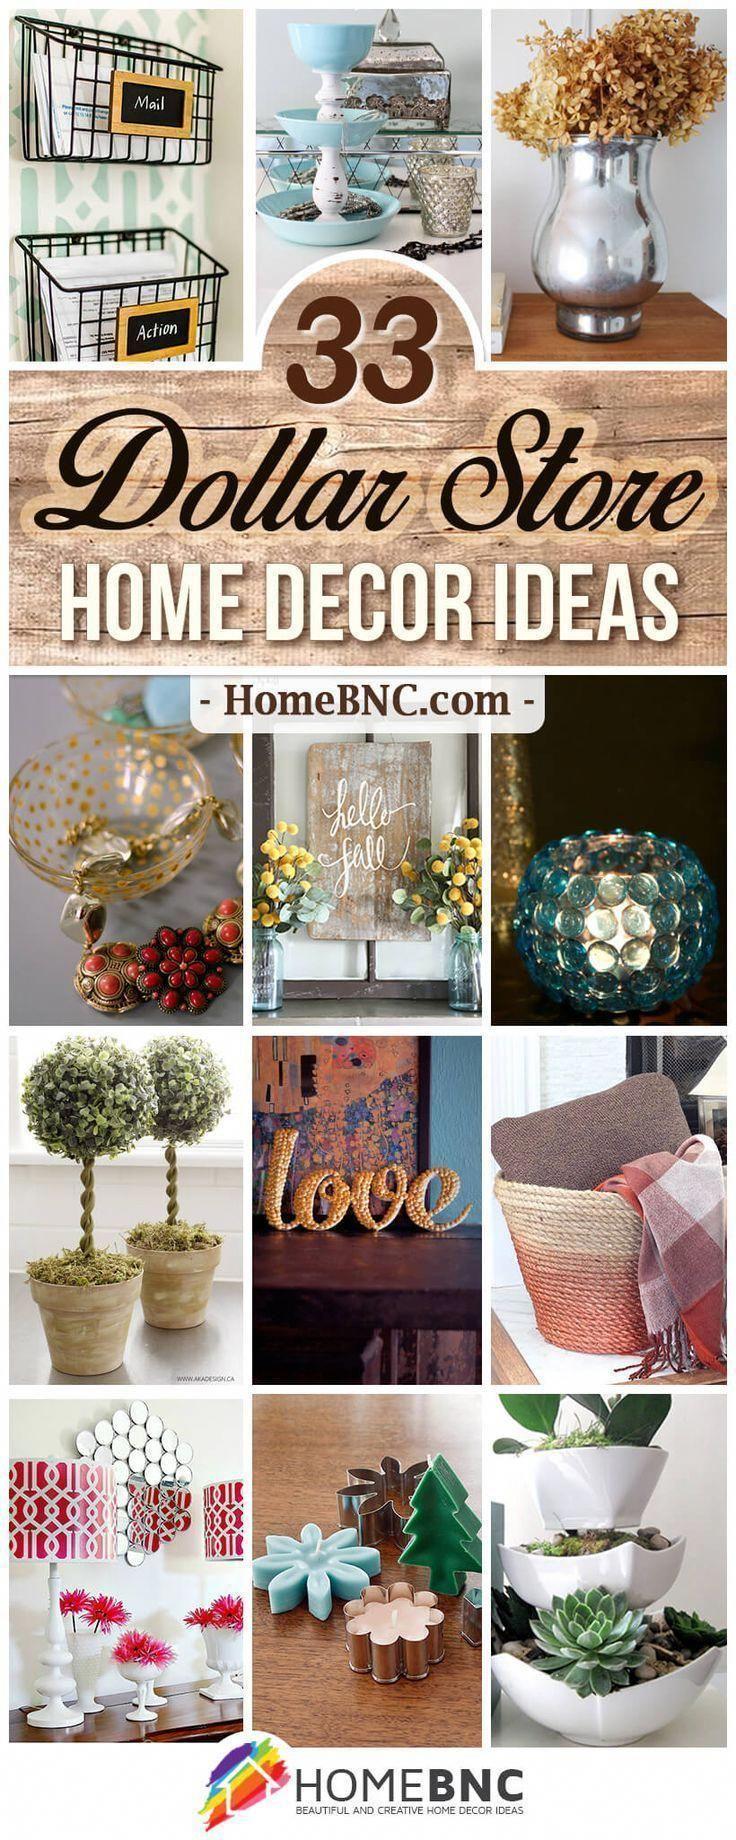 50 Impressive Diy Dollar Store Home Decor Ideas For Designers On A Budget Dollar Store Decor Handmade Home Dollar Store Diy